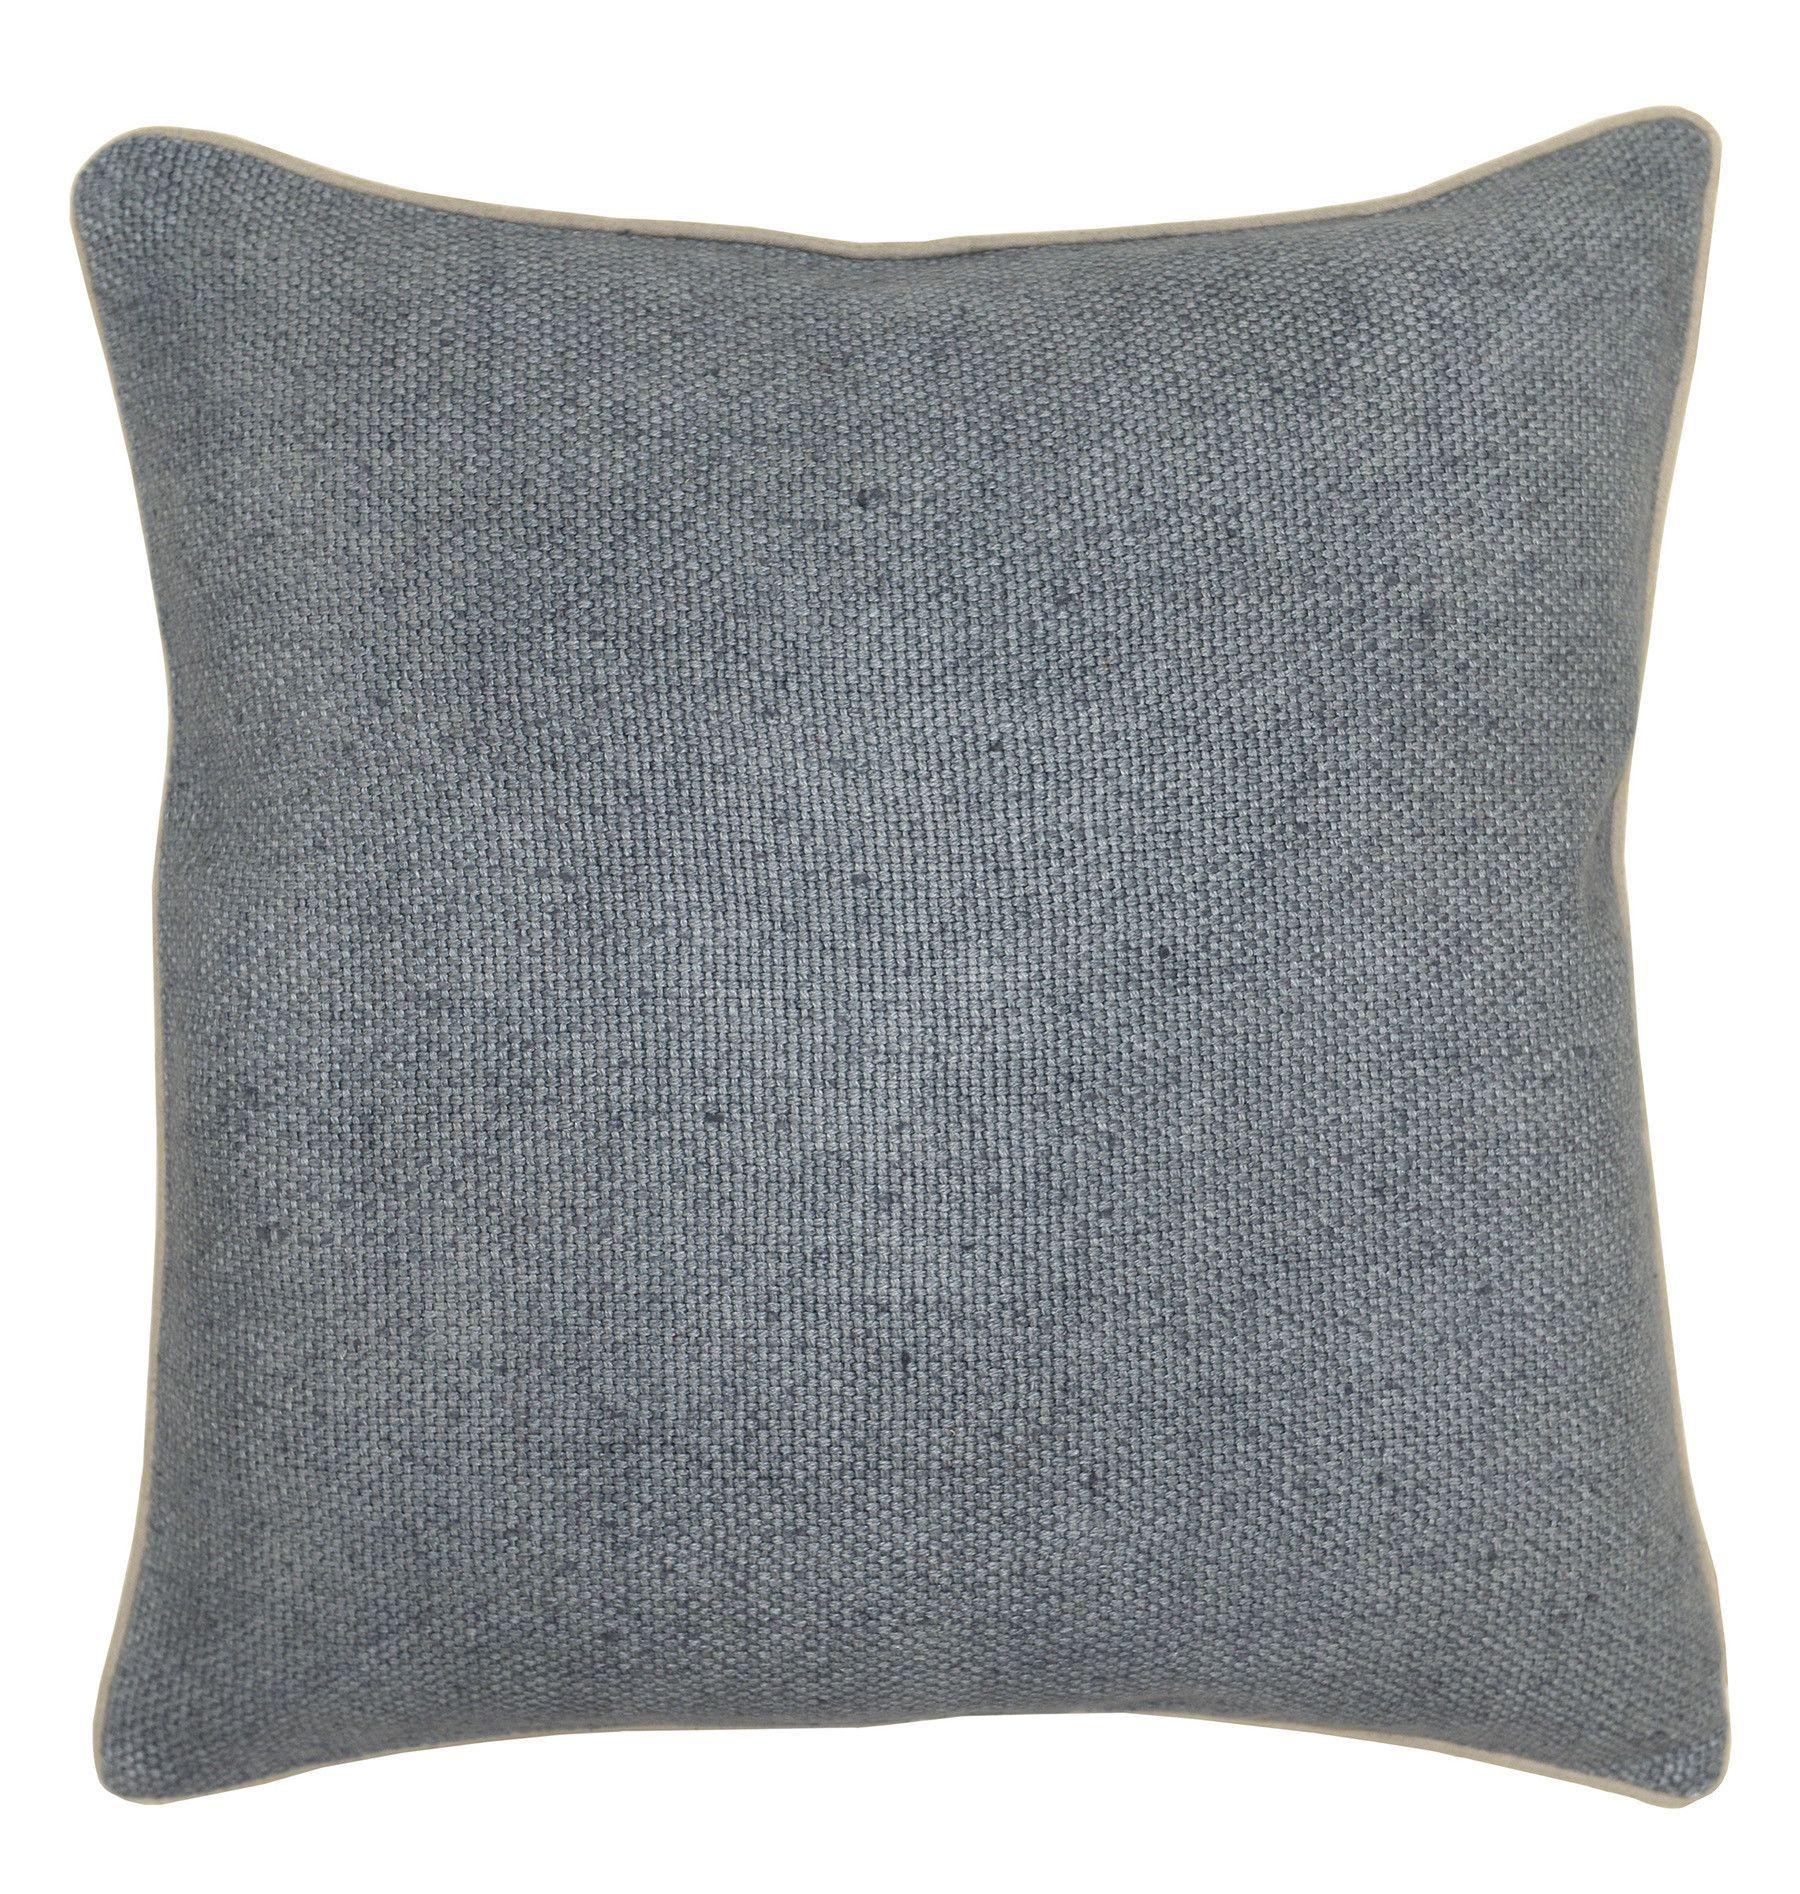 Kosas Home Quinn Cotton Throw Pillow Blue Throw Pillows Pillows Throw Pillows